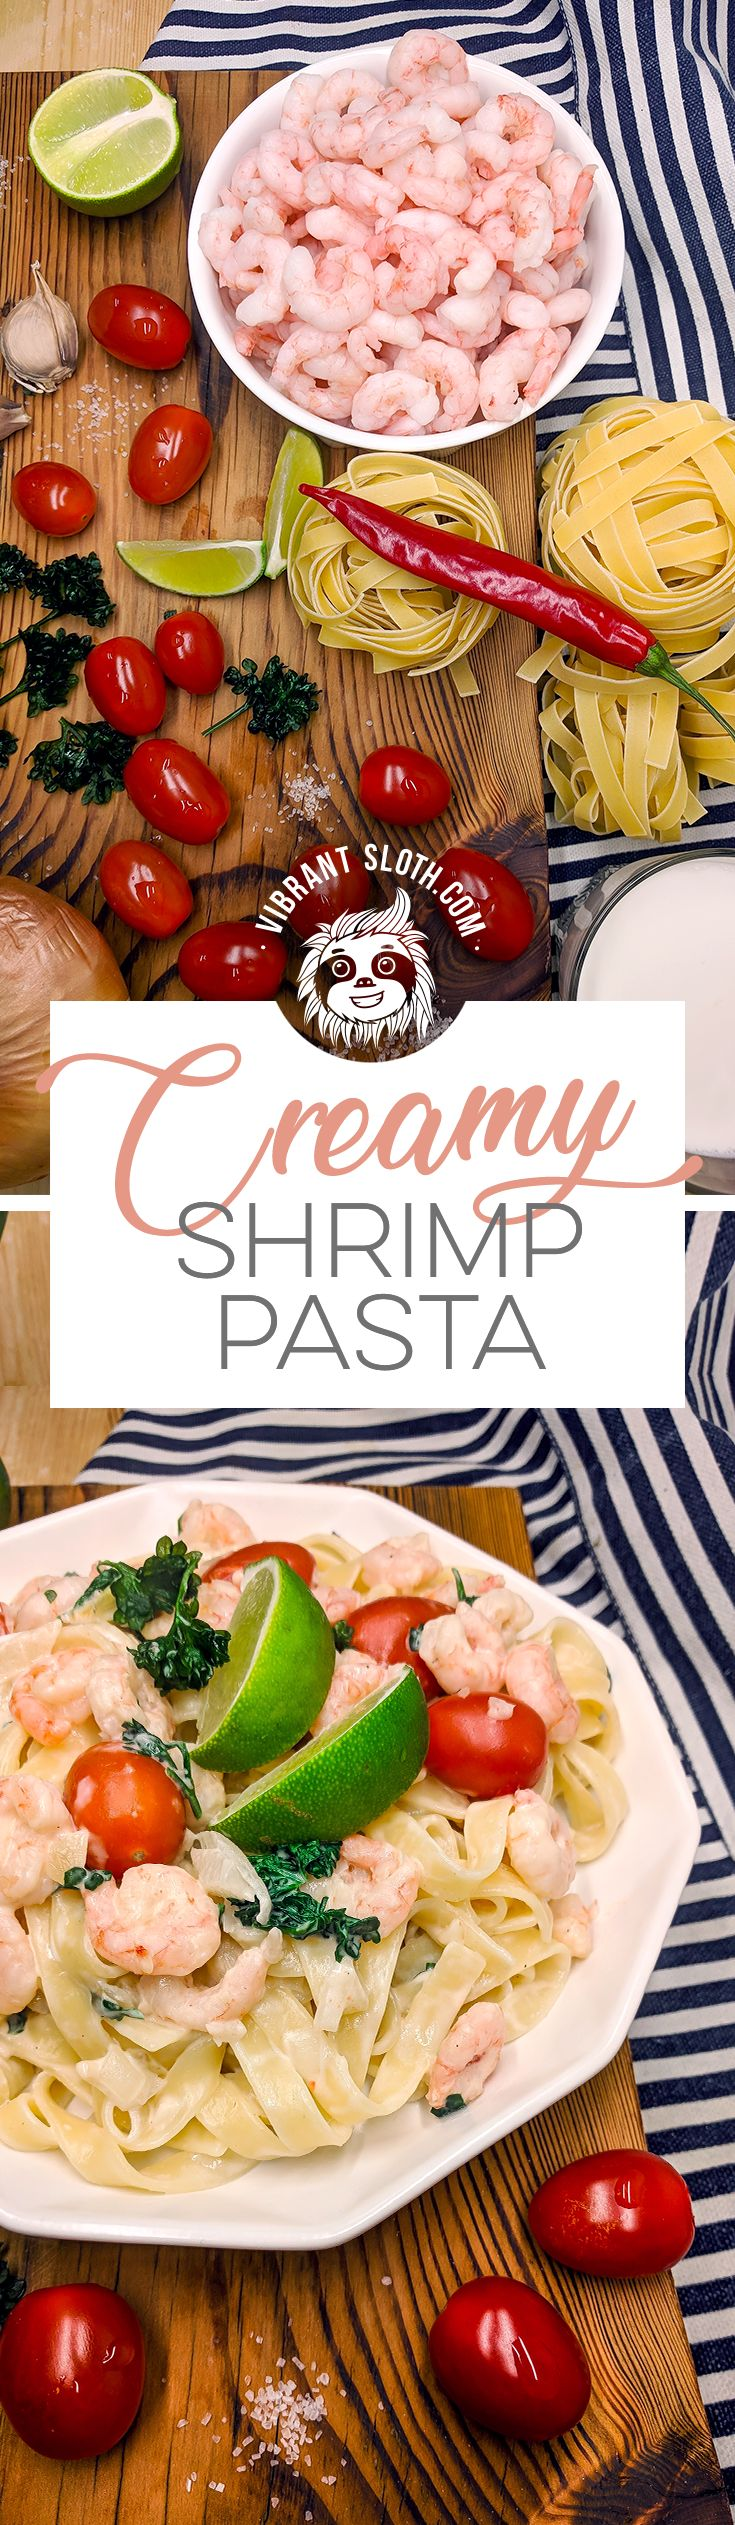 Shrimp pasta, Shrimp recipe, Healthy shrimp dinner, Easy recipe, Creamy pasta, Best shrimp dishes, Shrimp noodles, Frozen shrimp